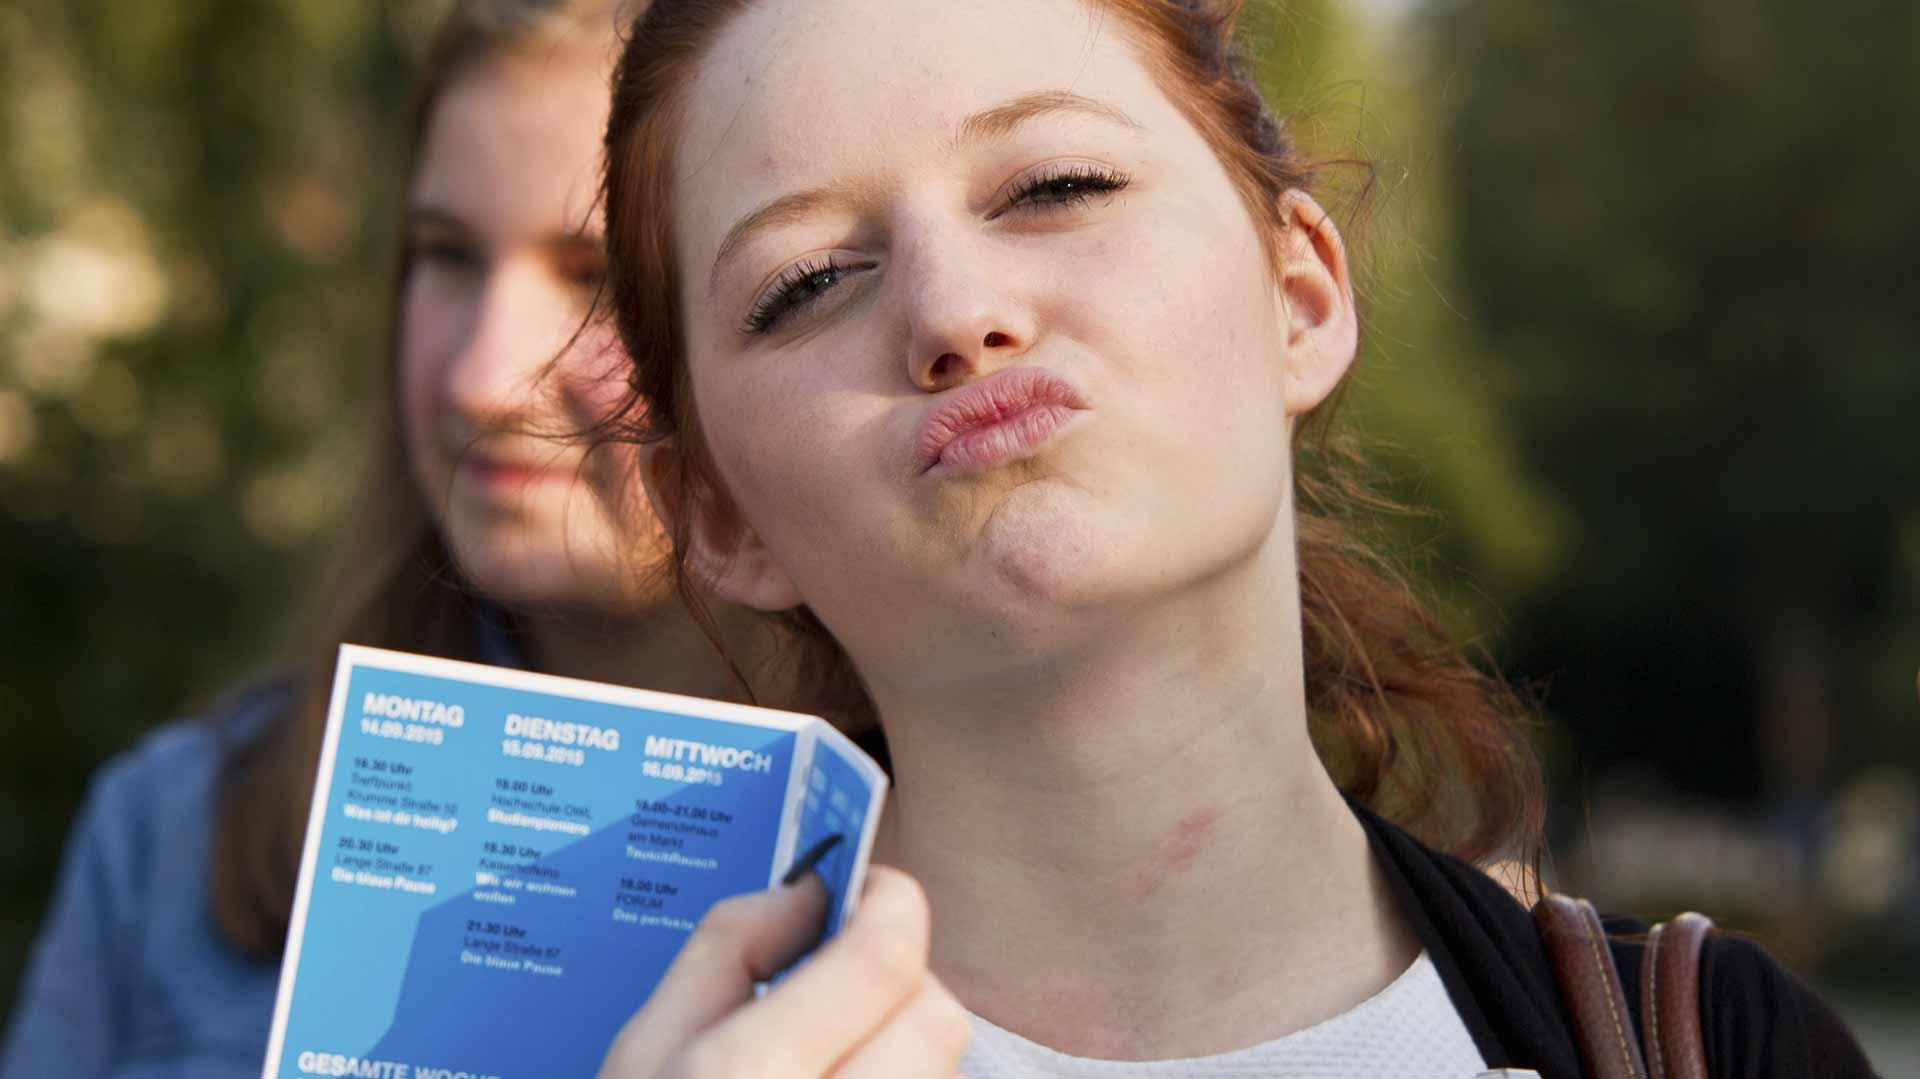 B-WUSST küssende Frau mit Programm